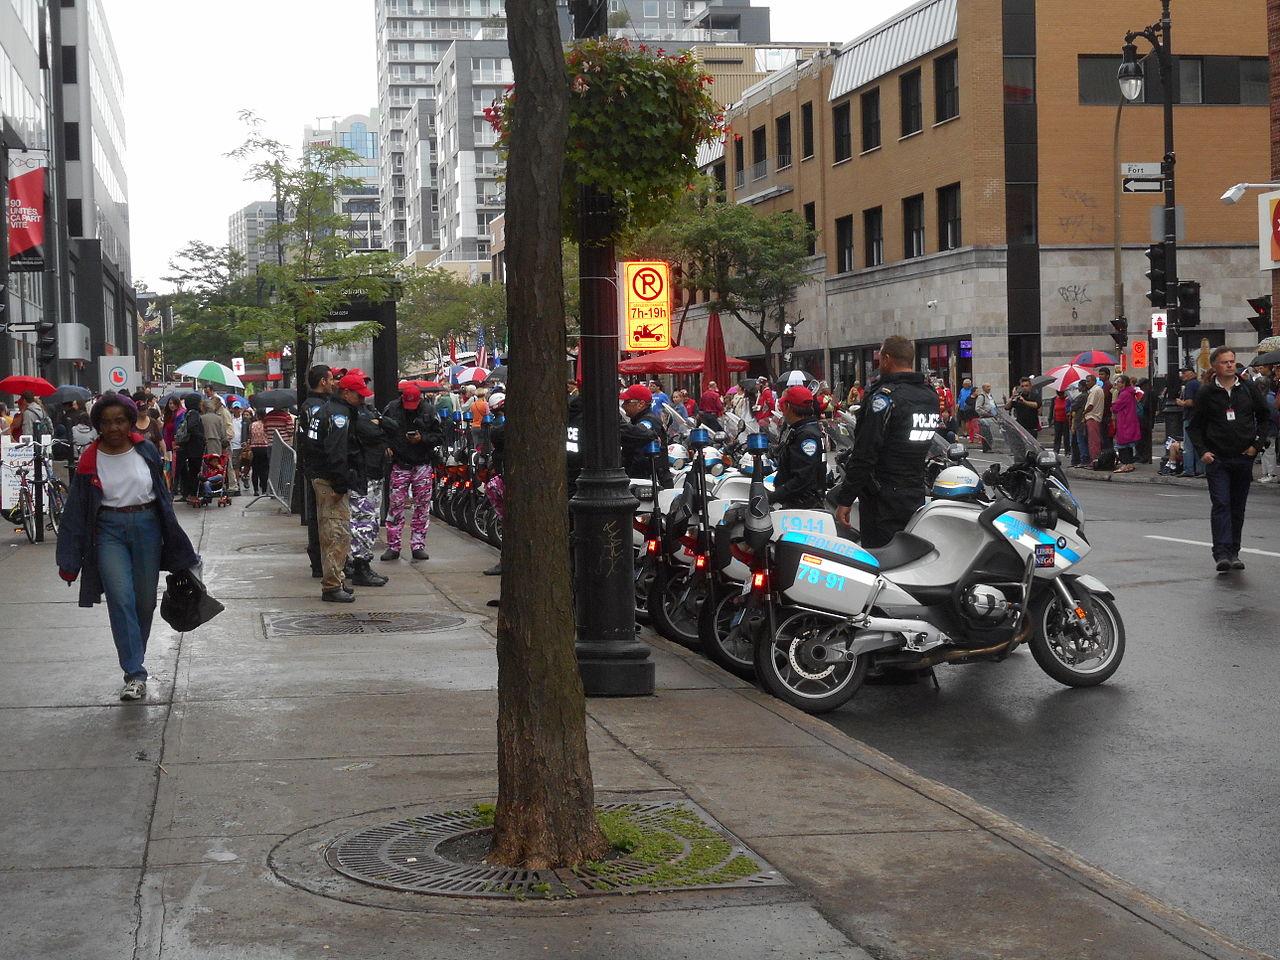 File:Canada Day 2015 on Saint Catherine Street - 035.jpg - Wikimedia